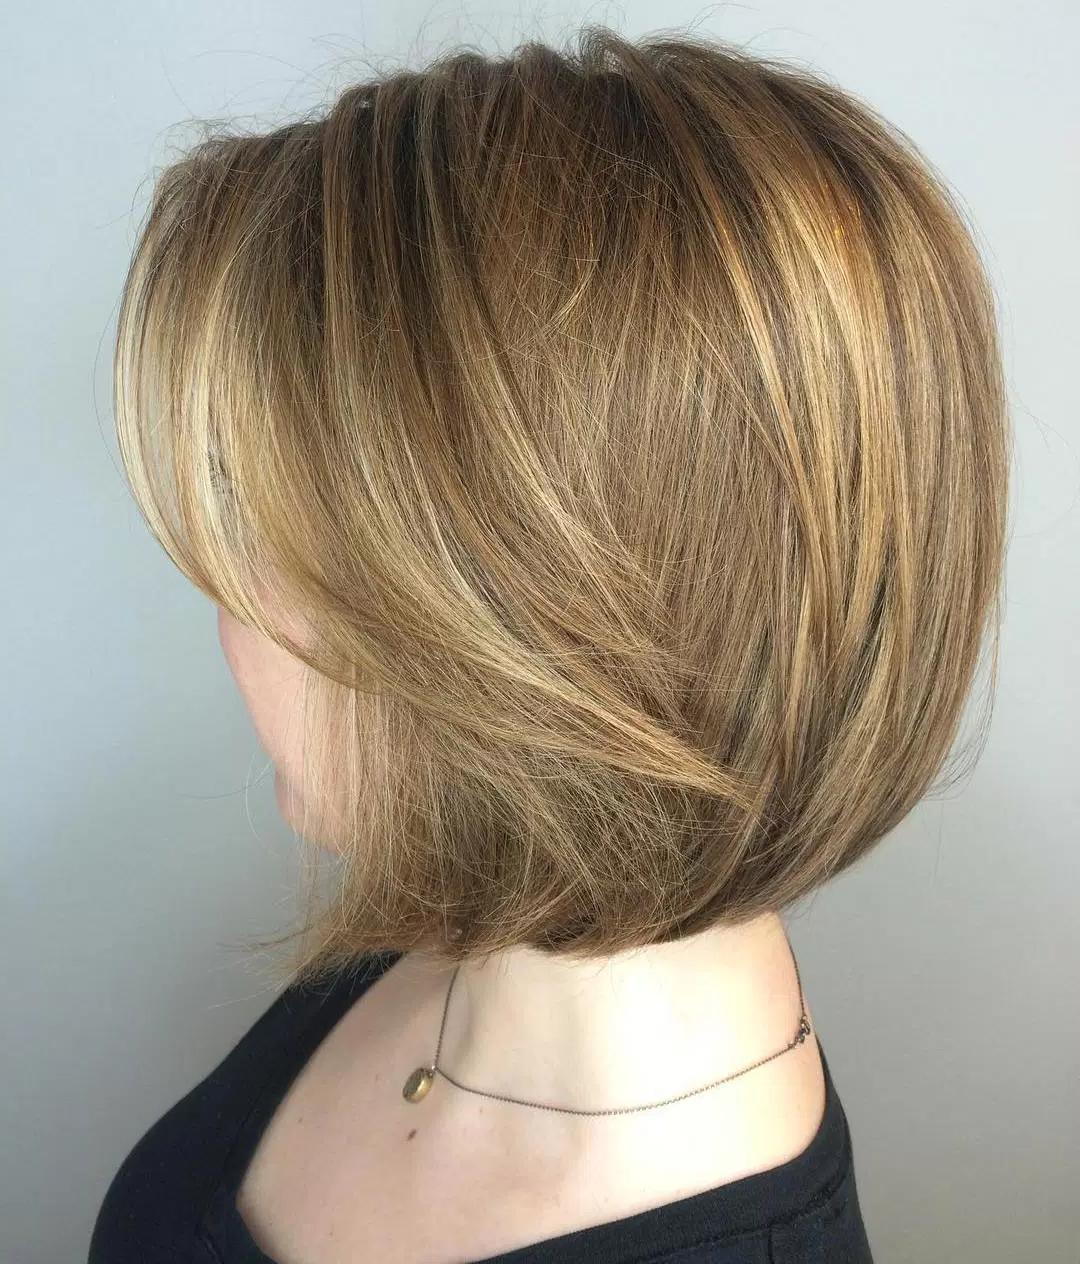 70 Fine Hair Bob Cuts – Fallbrook247 With Regard To Sun Kissed Bob Haircuts (View 9 of 20)